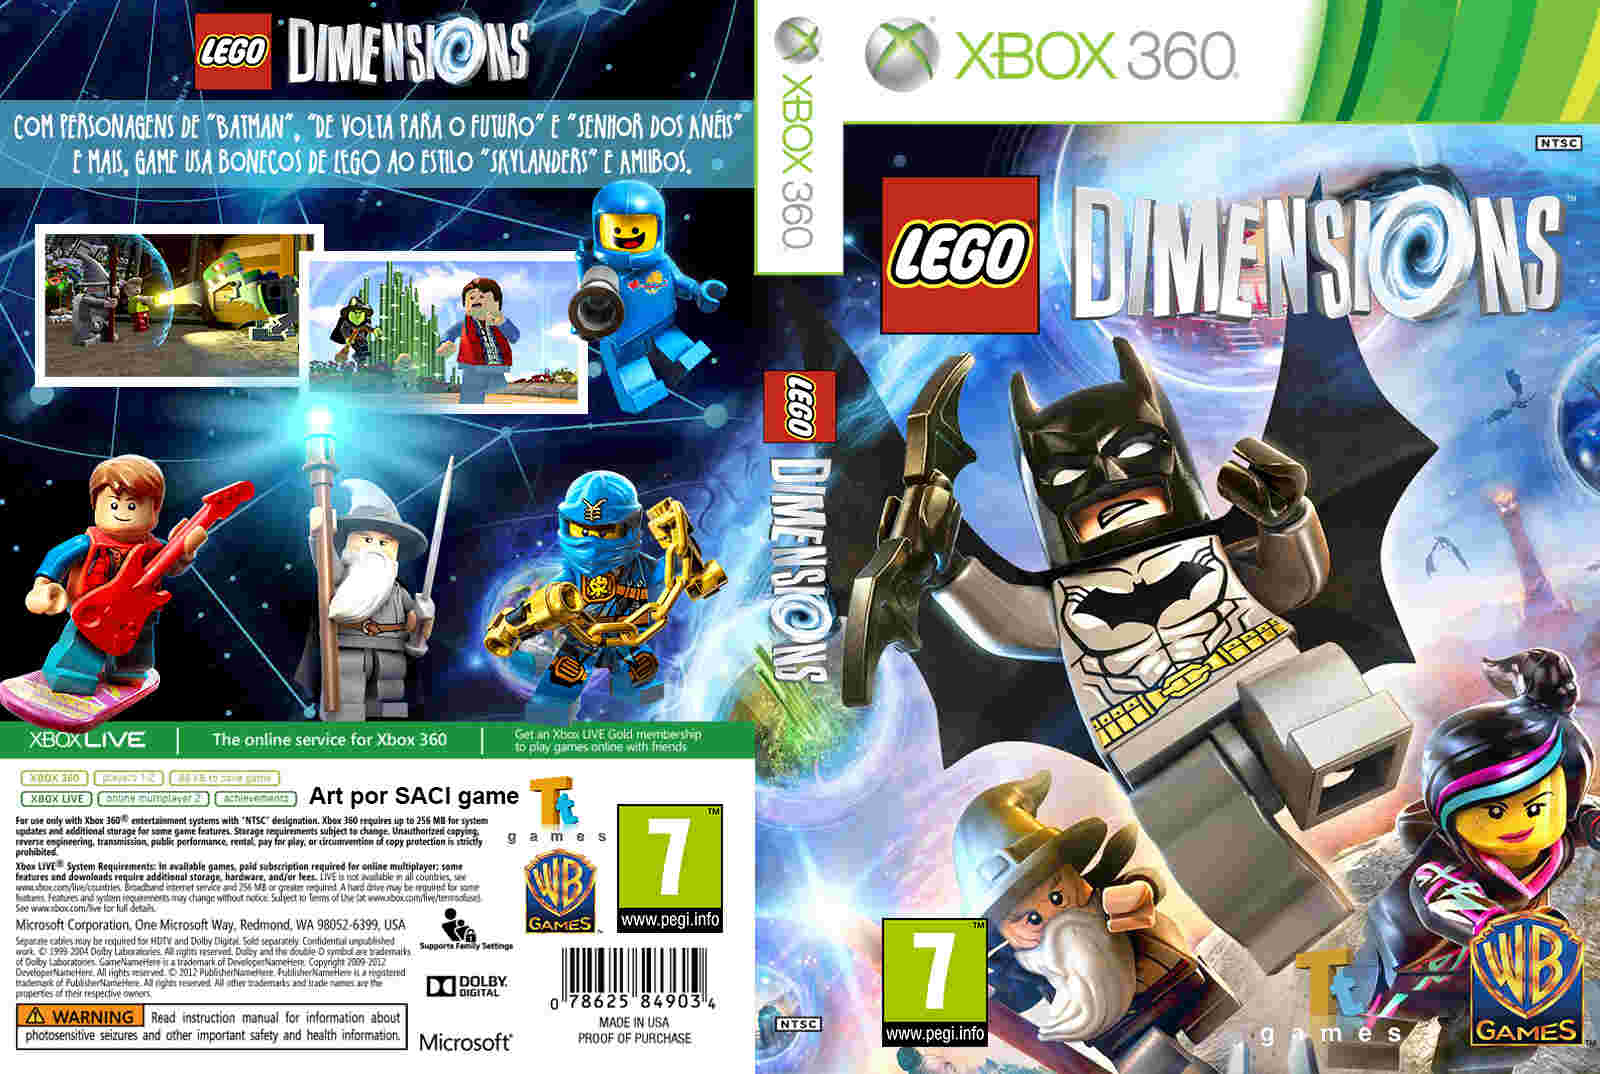 Tudo Gtba: LEGO Dimensions PAL - Cover & Label Game XBox 360Xbox 360 Game Cover Dimensions